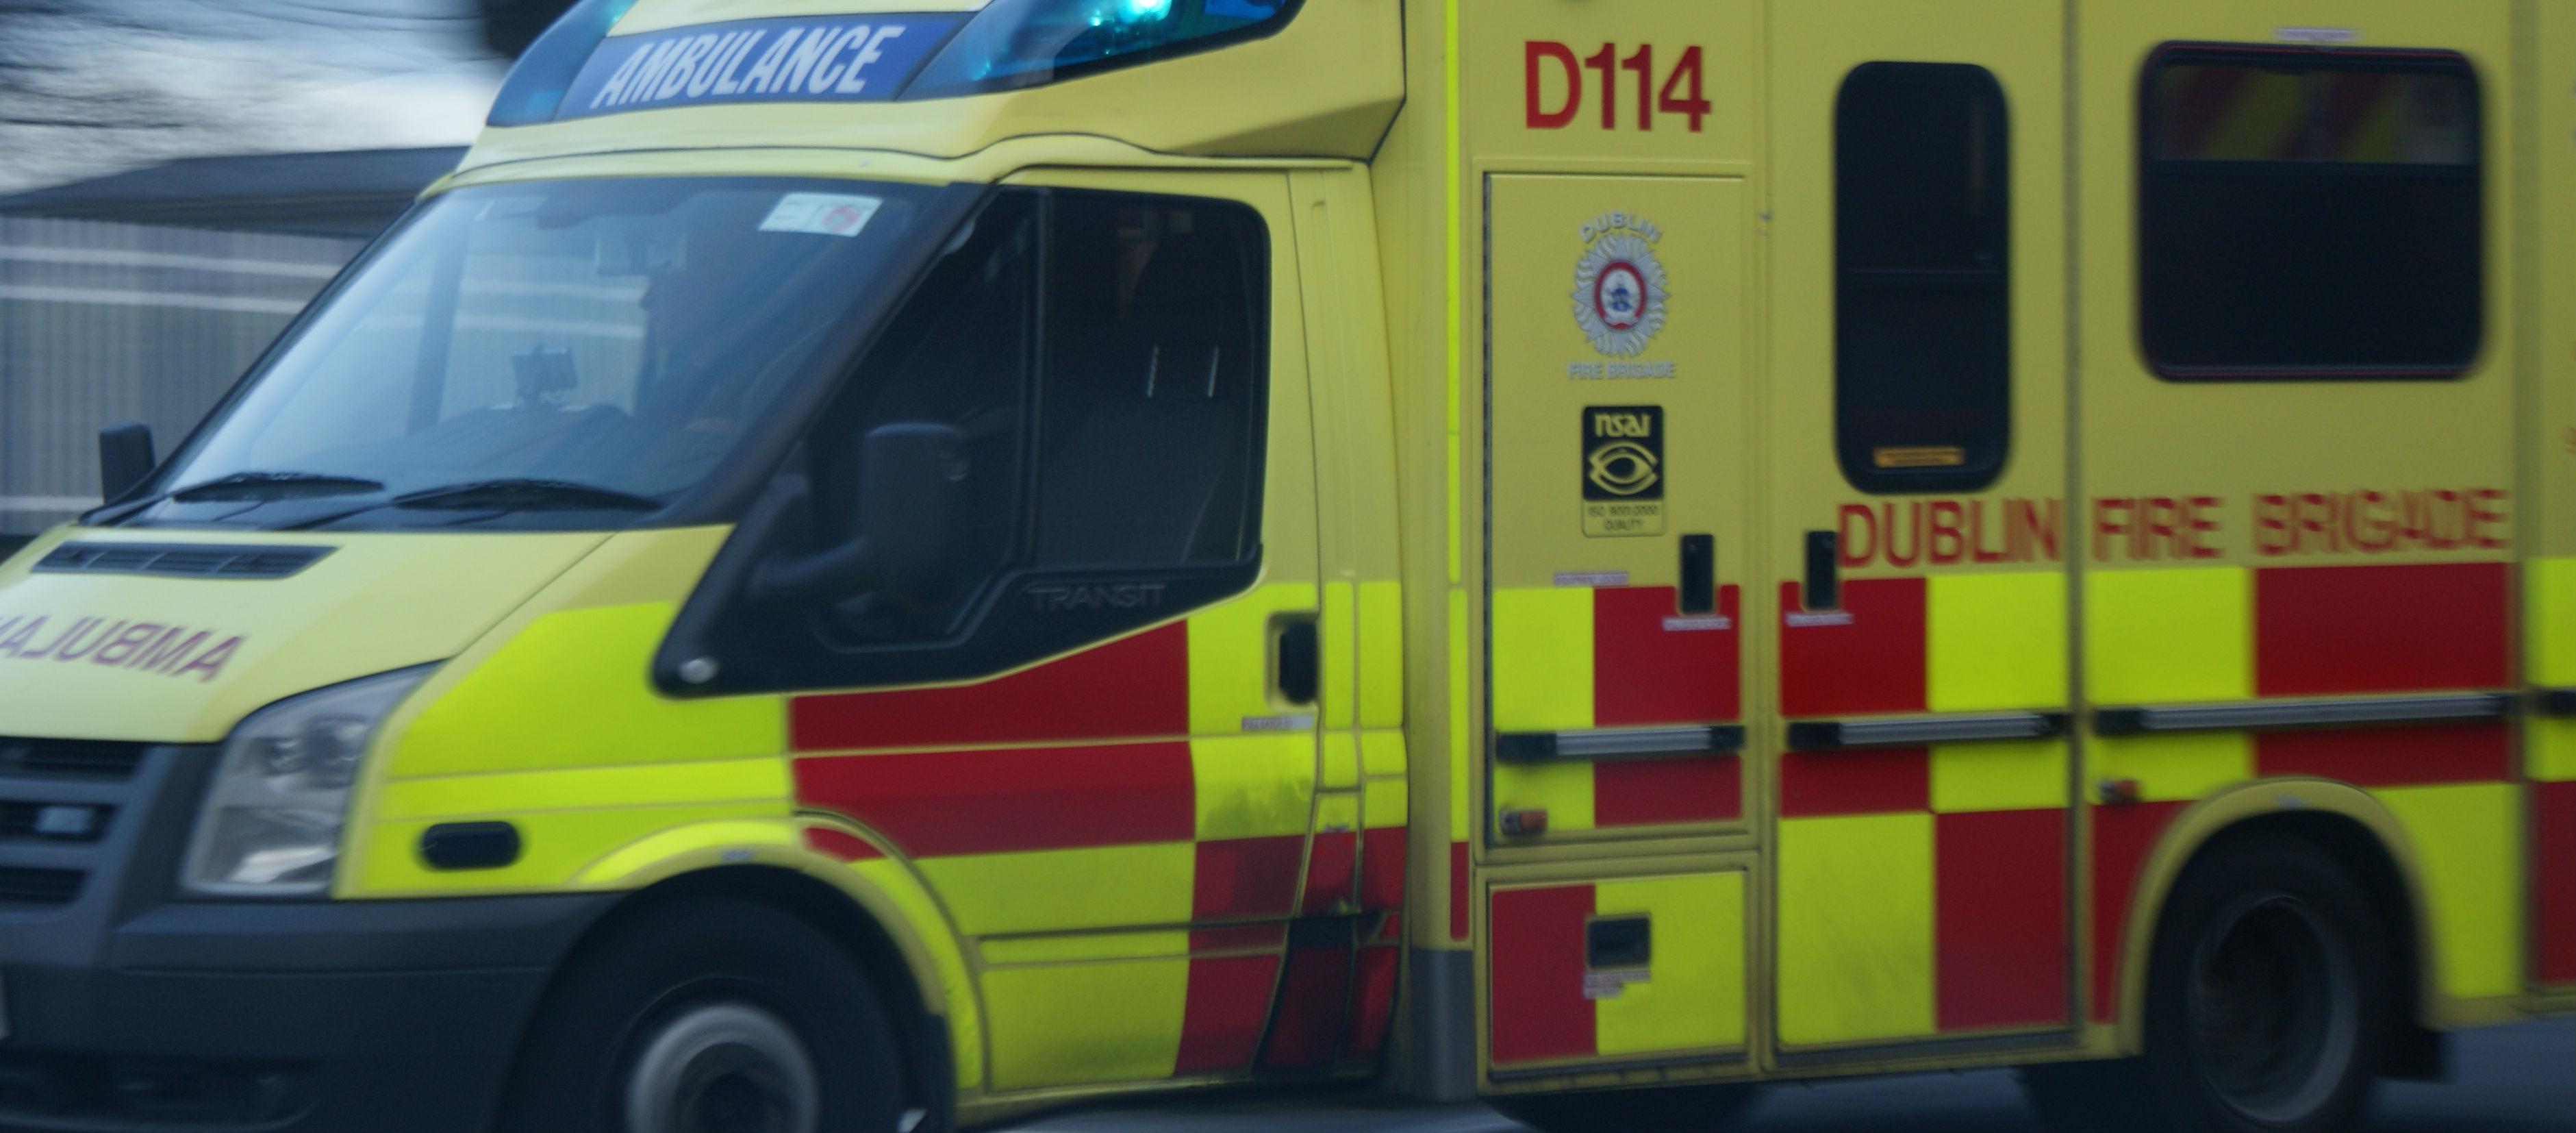 Dublin Fire Brigade help deliver newborn